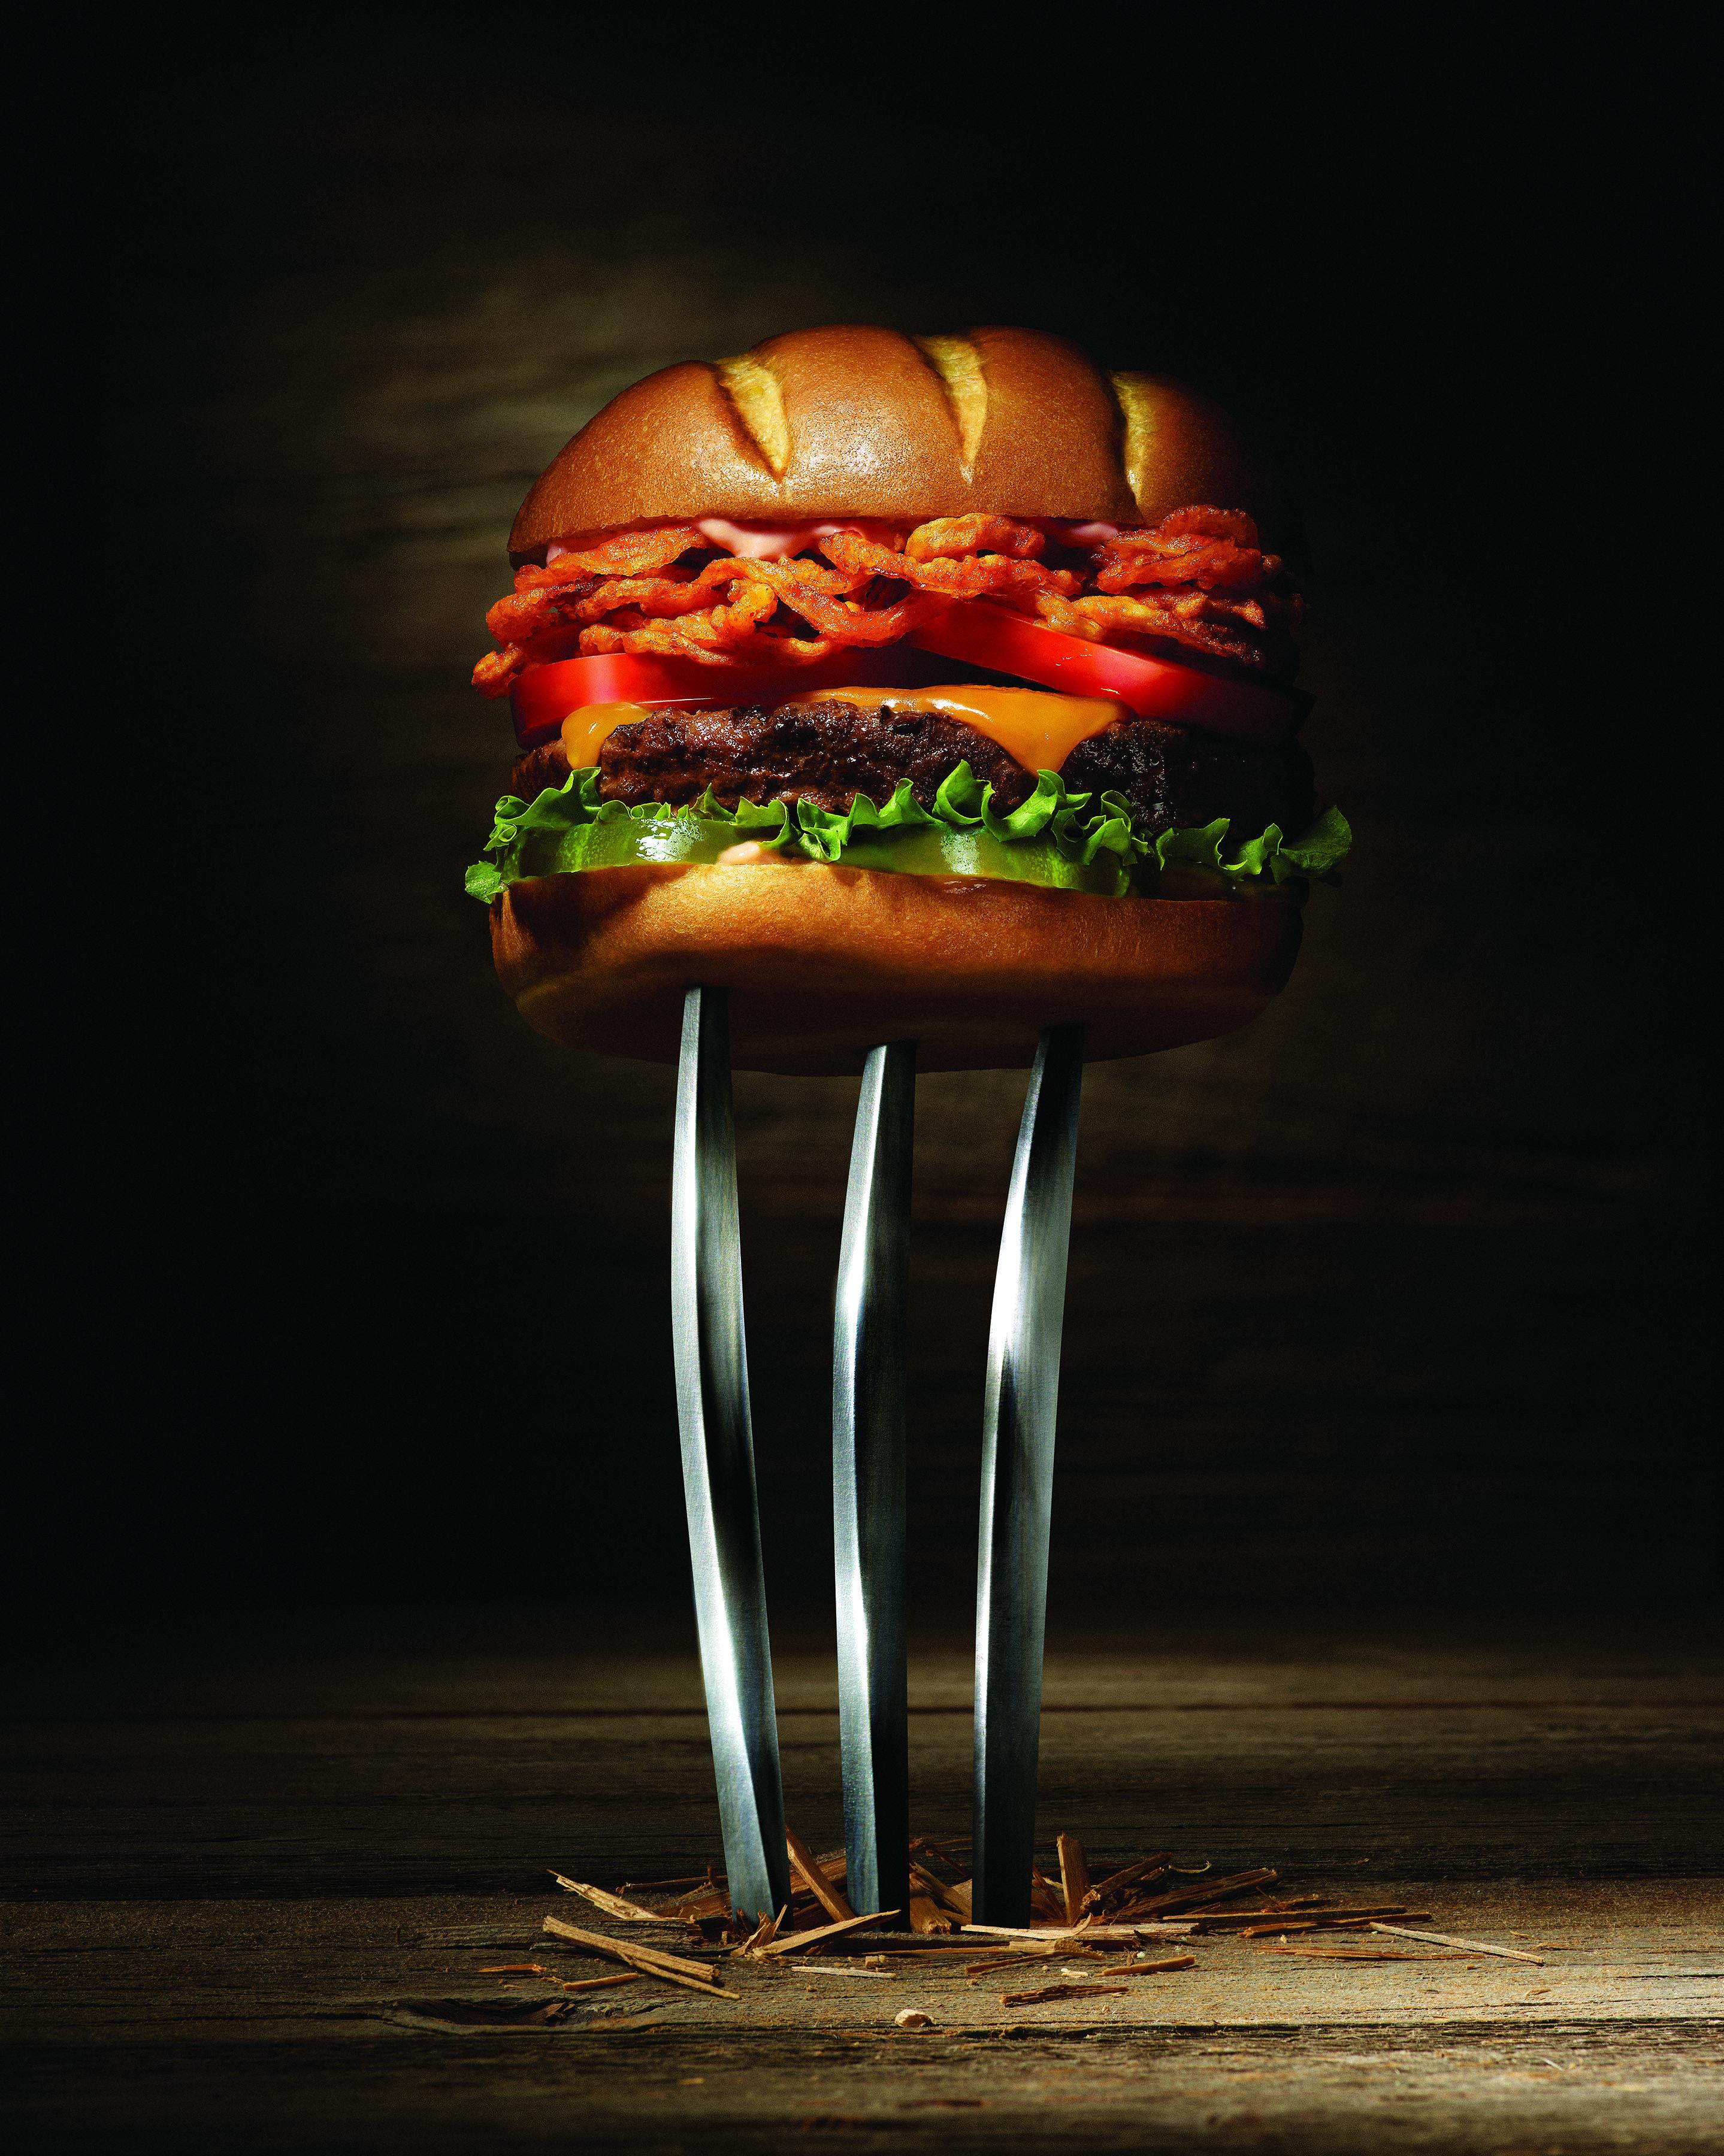 Смешной гамбургер в картинках, гимнастике картинки